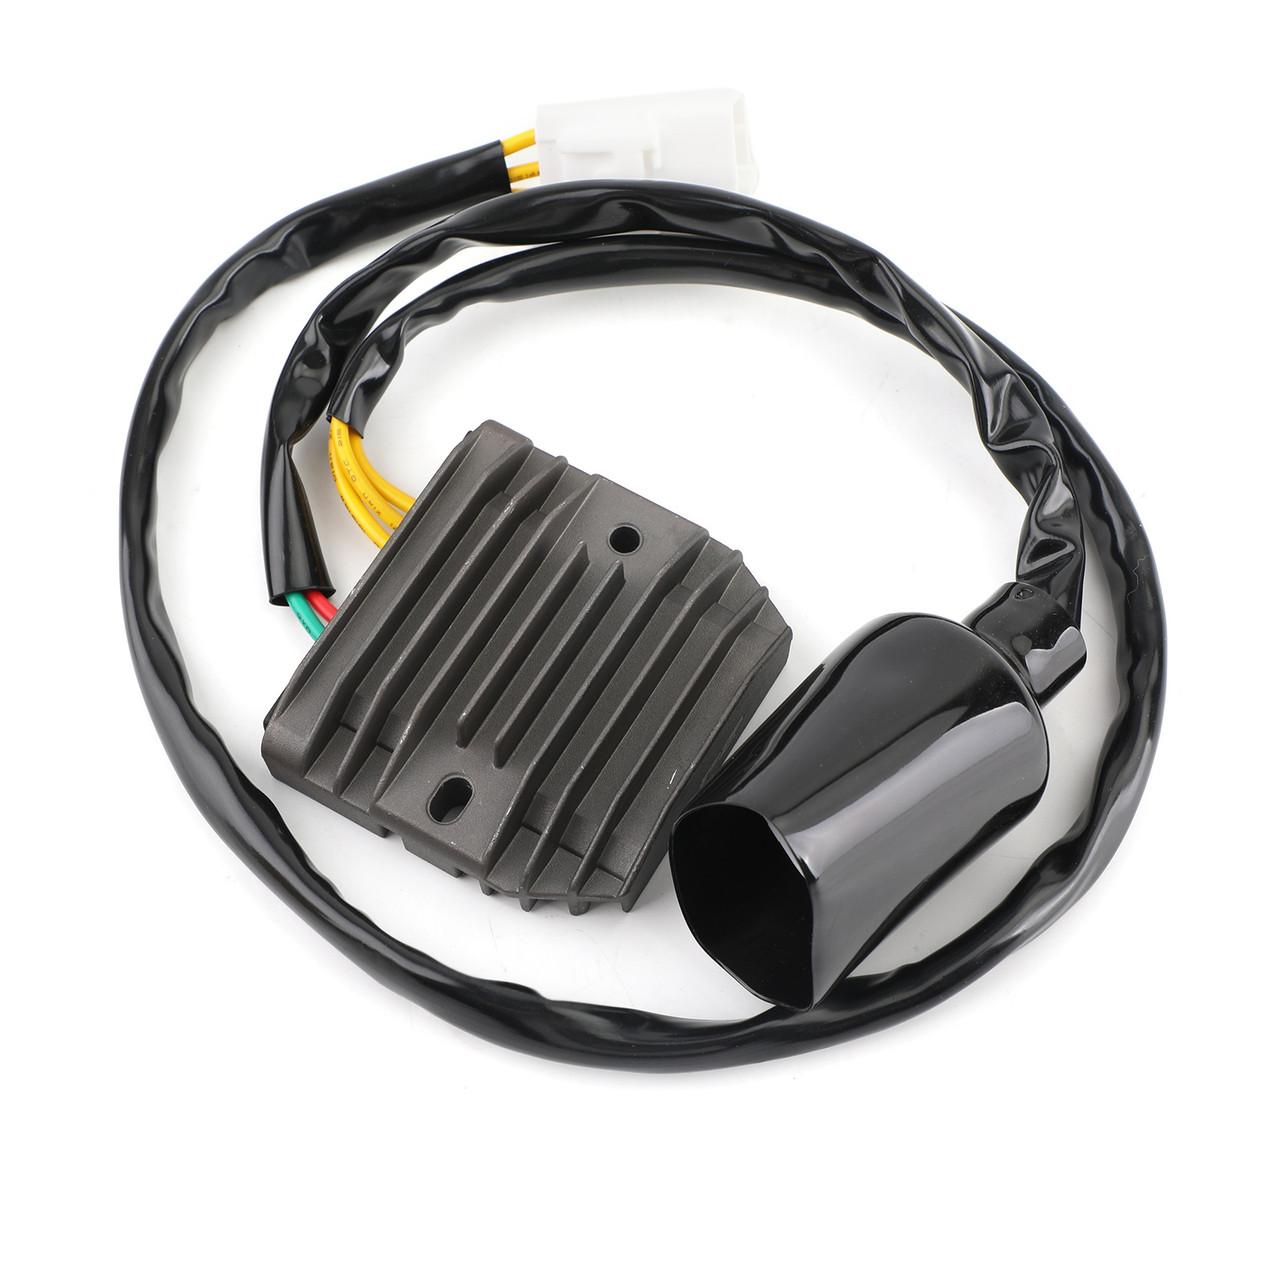 Voltage Regulator Rectifier Fit For Honda CBR1000RR (ABS) Fireblade CBR1000RA 09-16